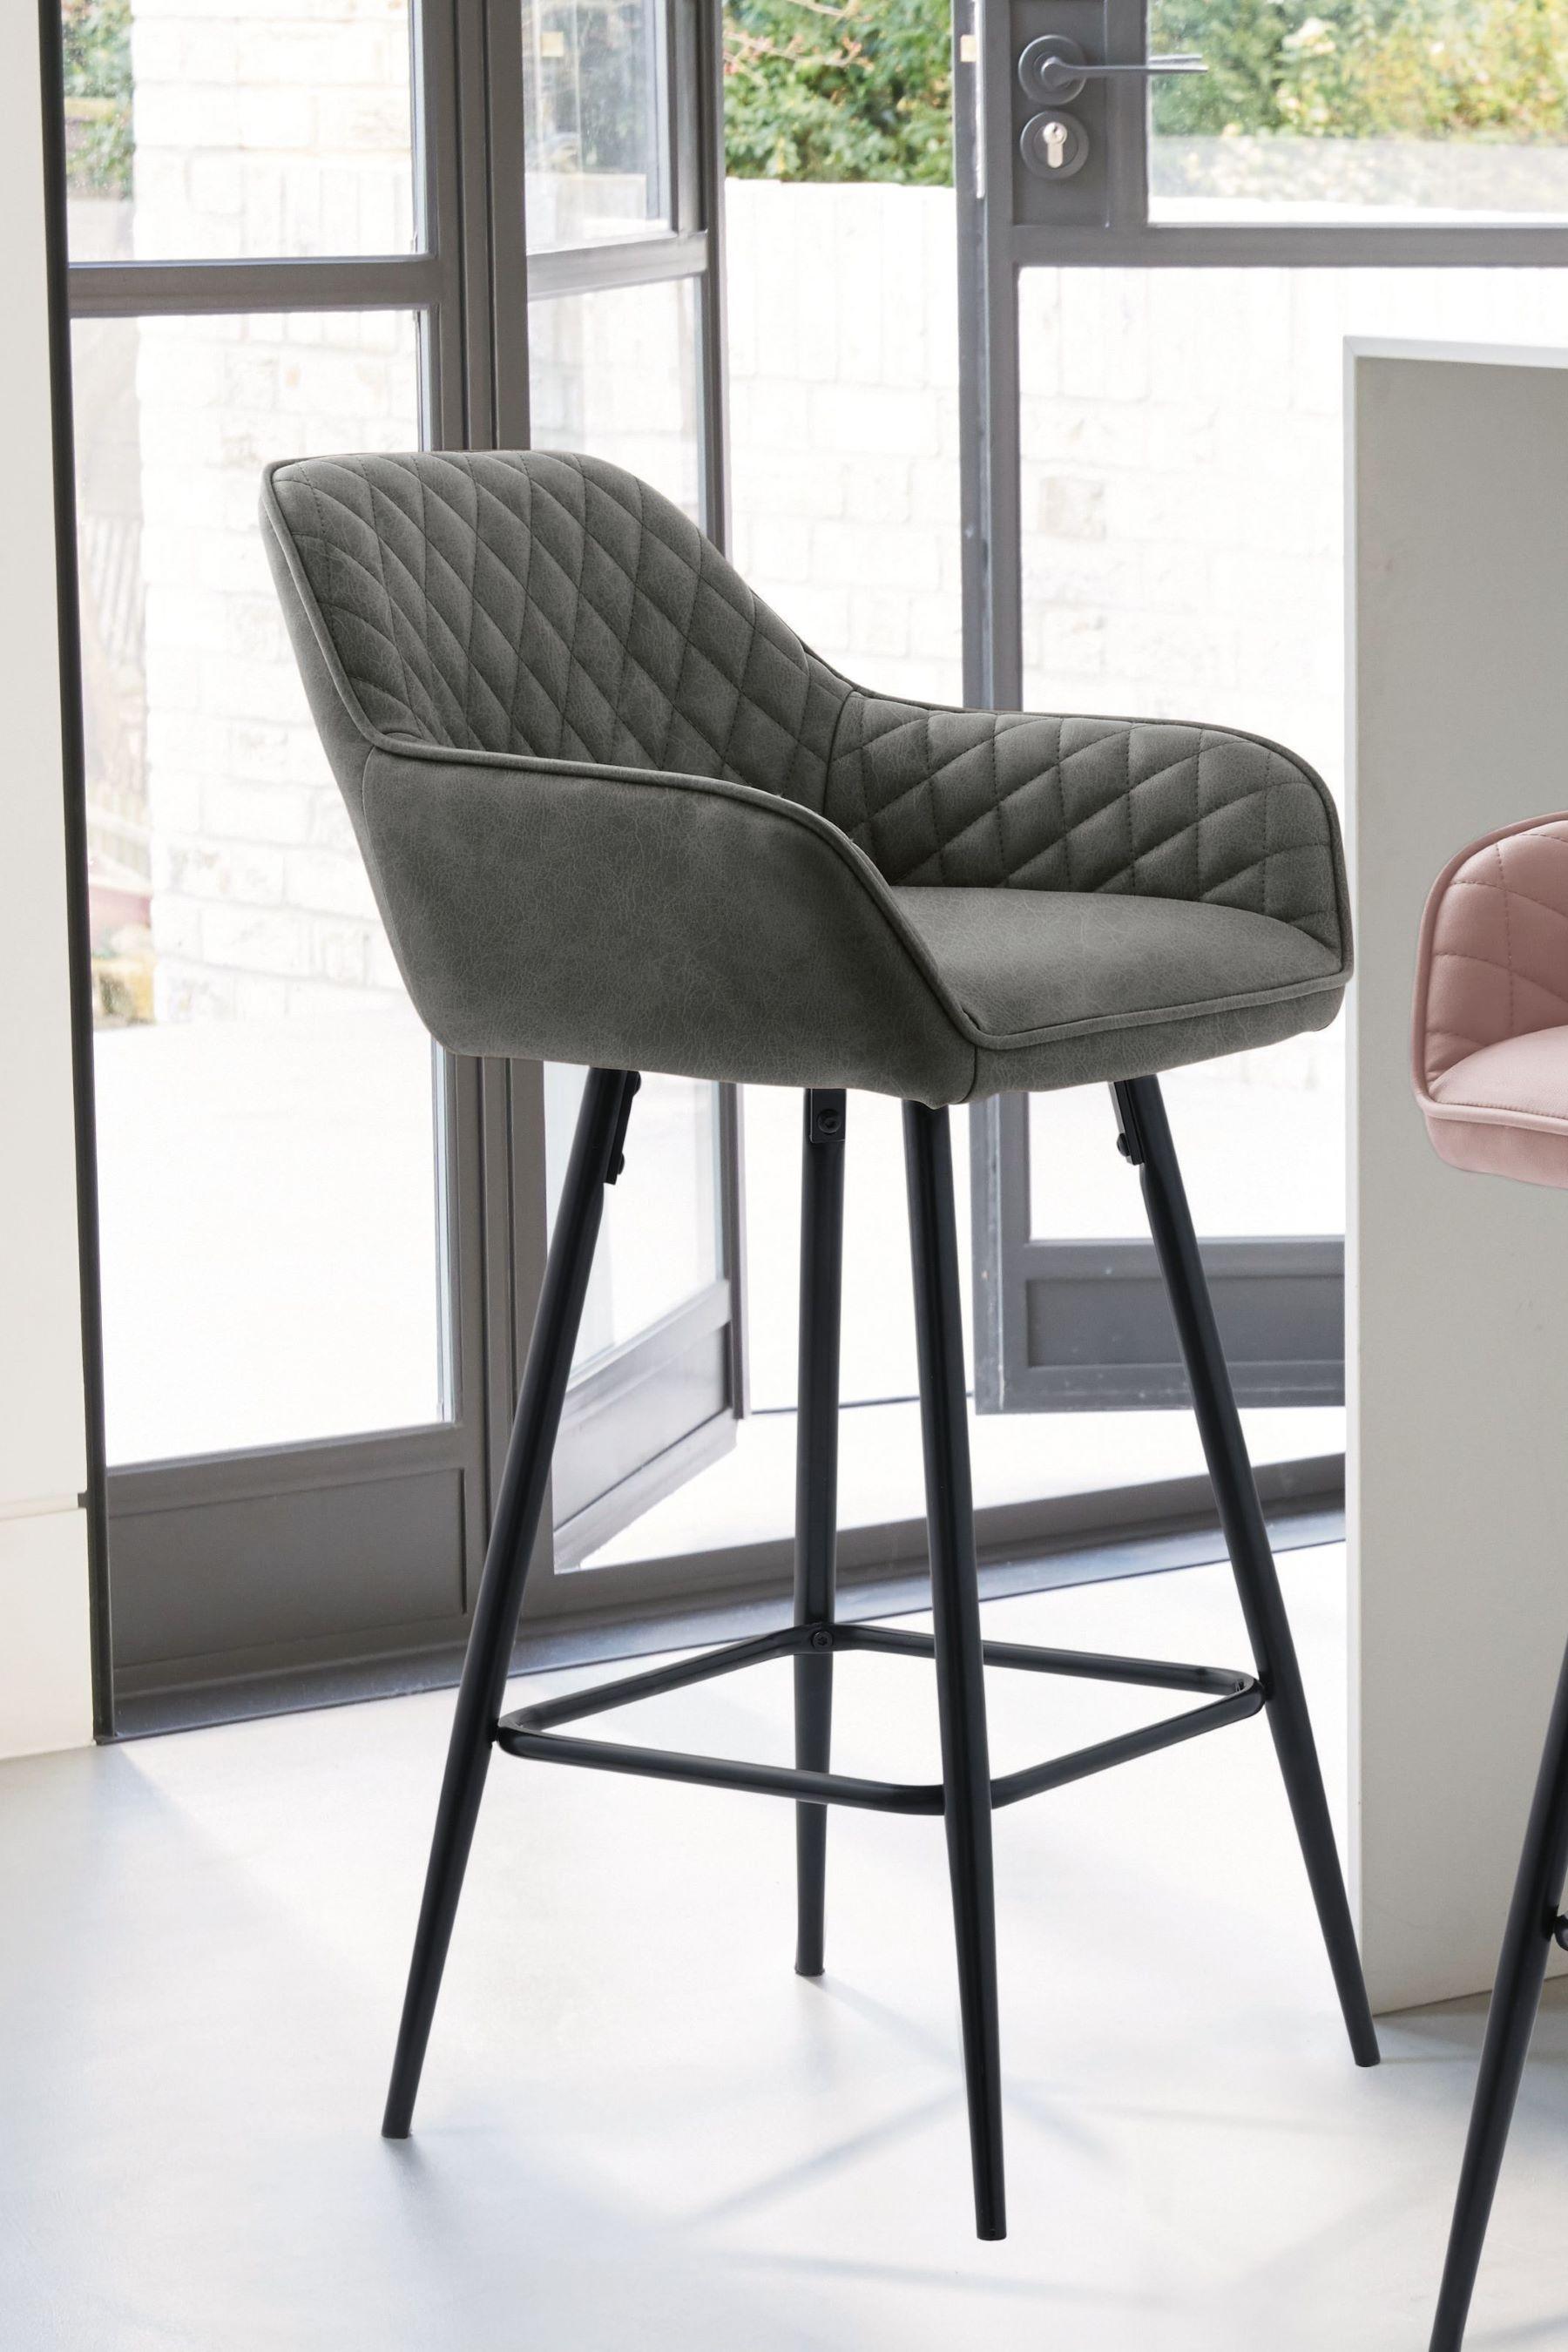 31746fda28fe Next Hamilton Bar Stool - Grey | Furniture to Acquire in 2019 | Bar ...